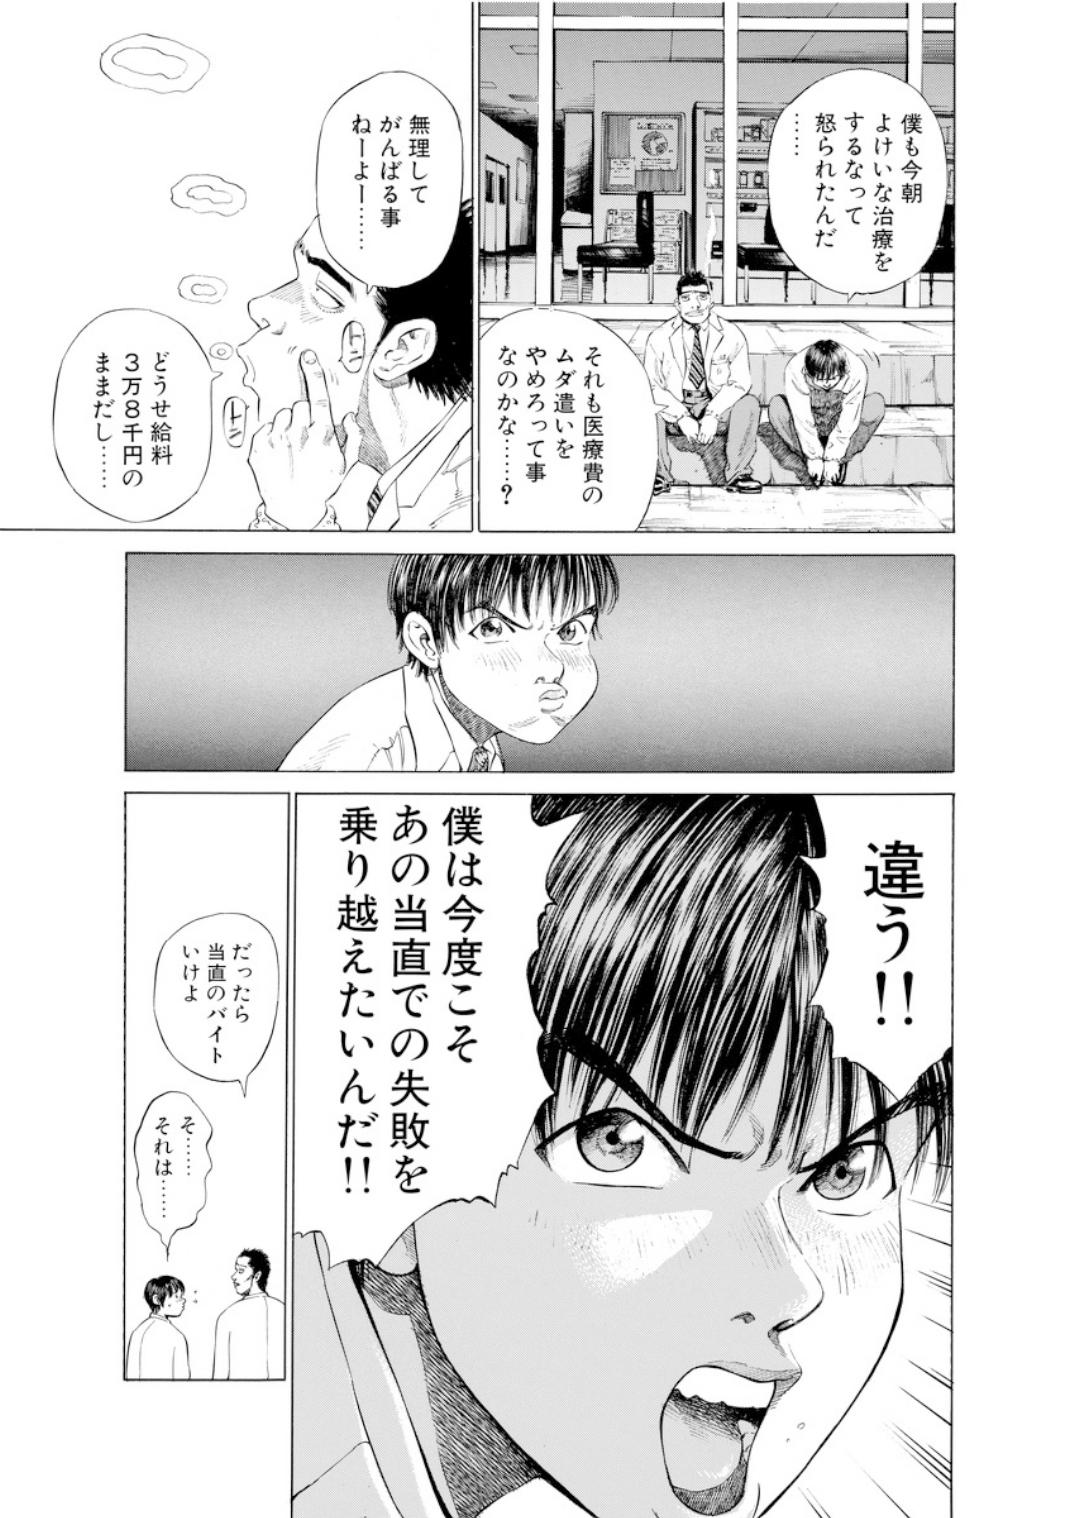 001bj_page-0095.jpg